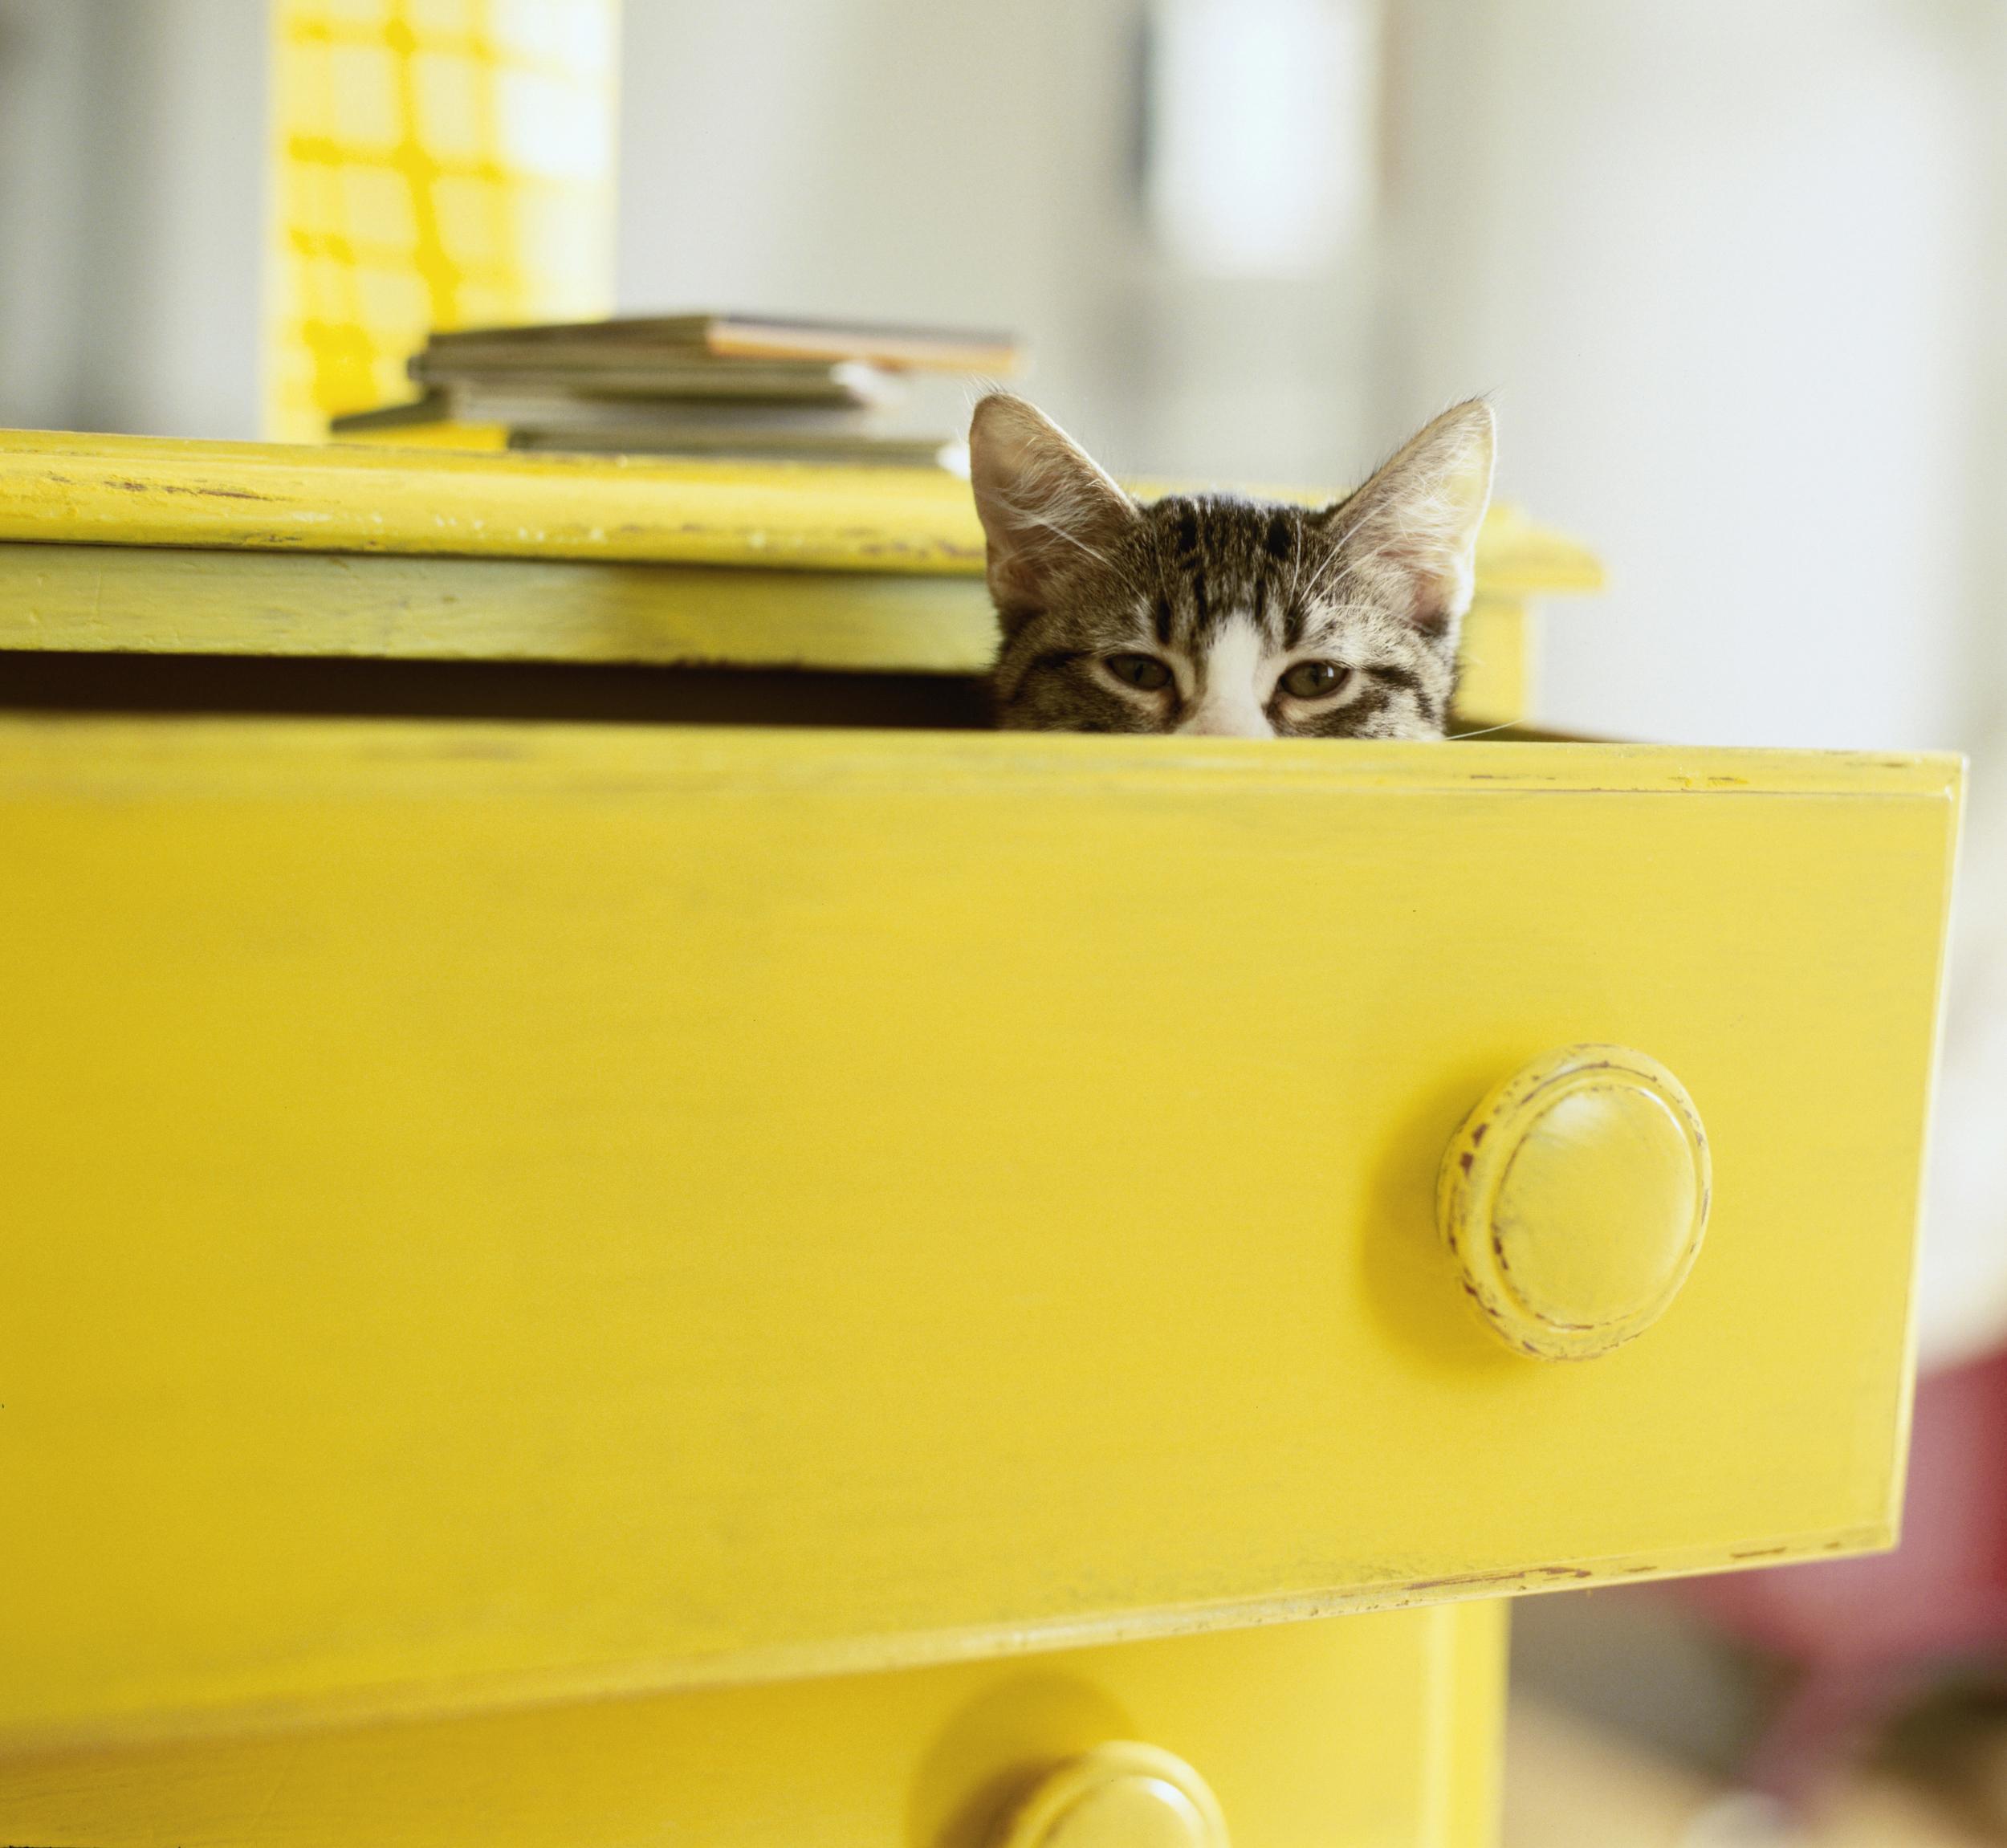 kitty in a yellow dresser.jpg